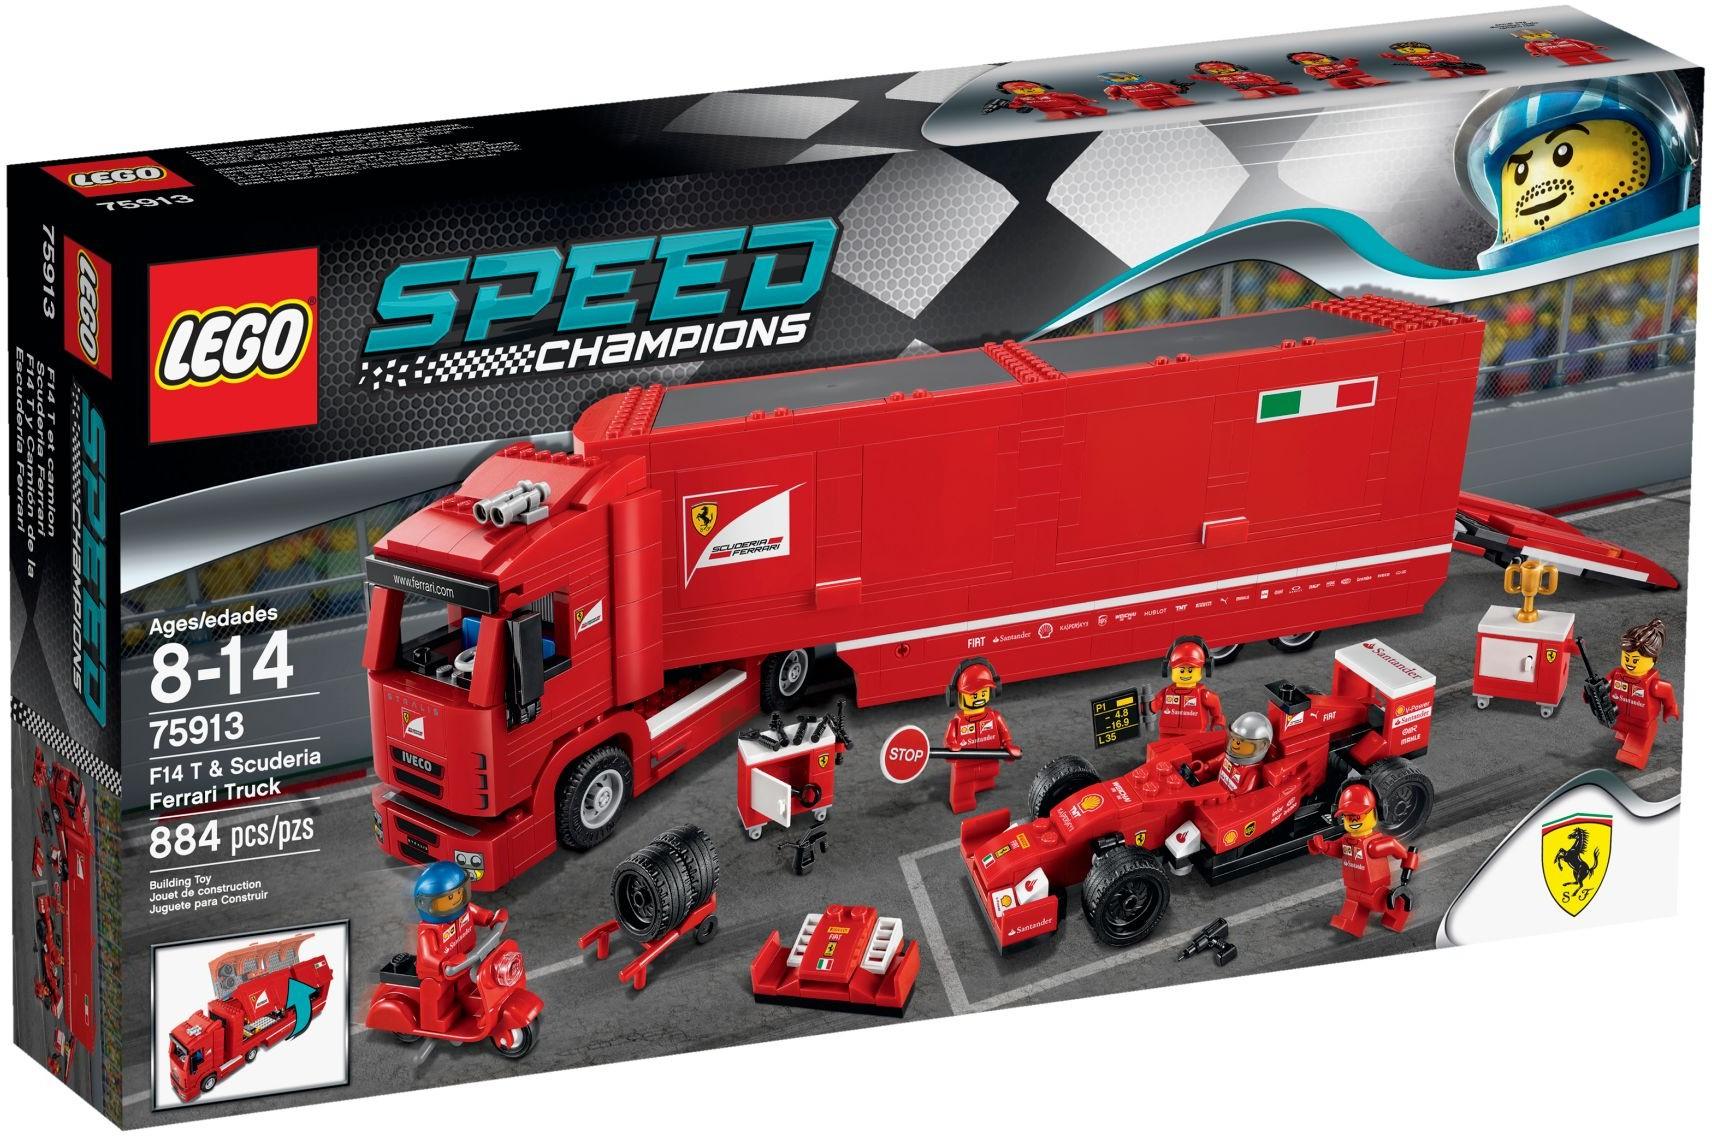 75913 LEGO F14 T & Scuderia Ferrari Truck 516